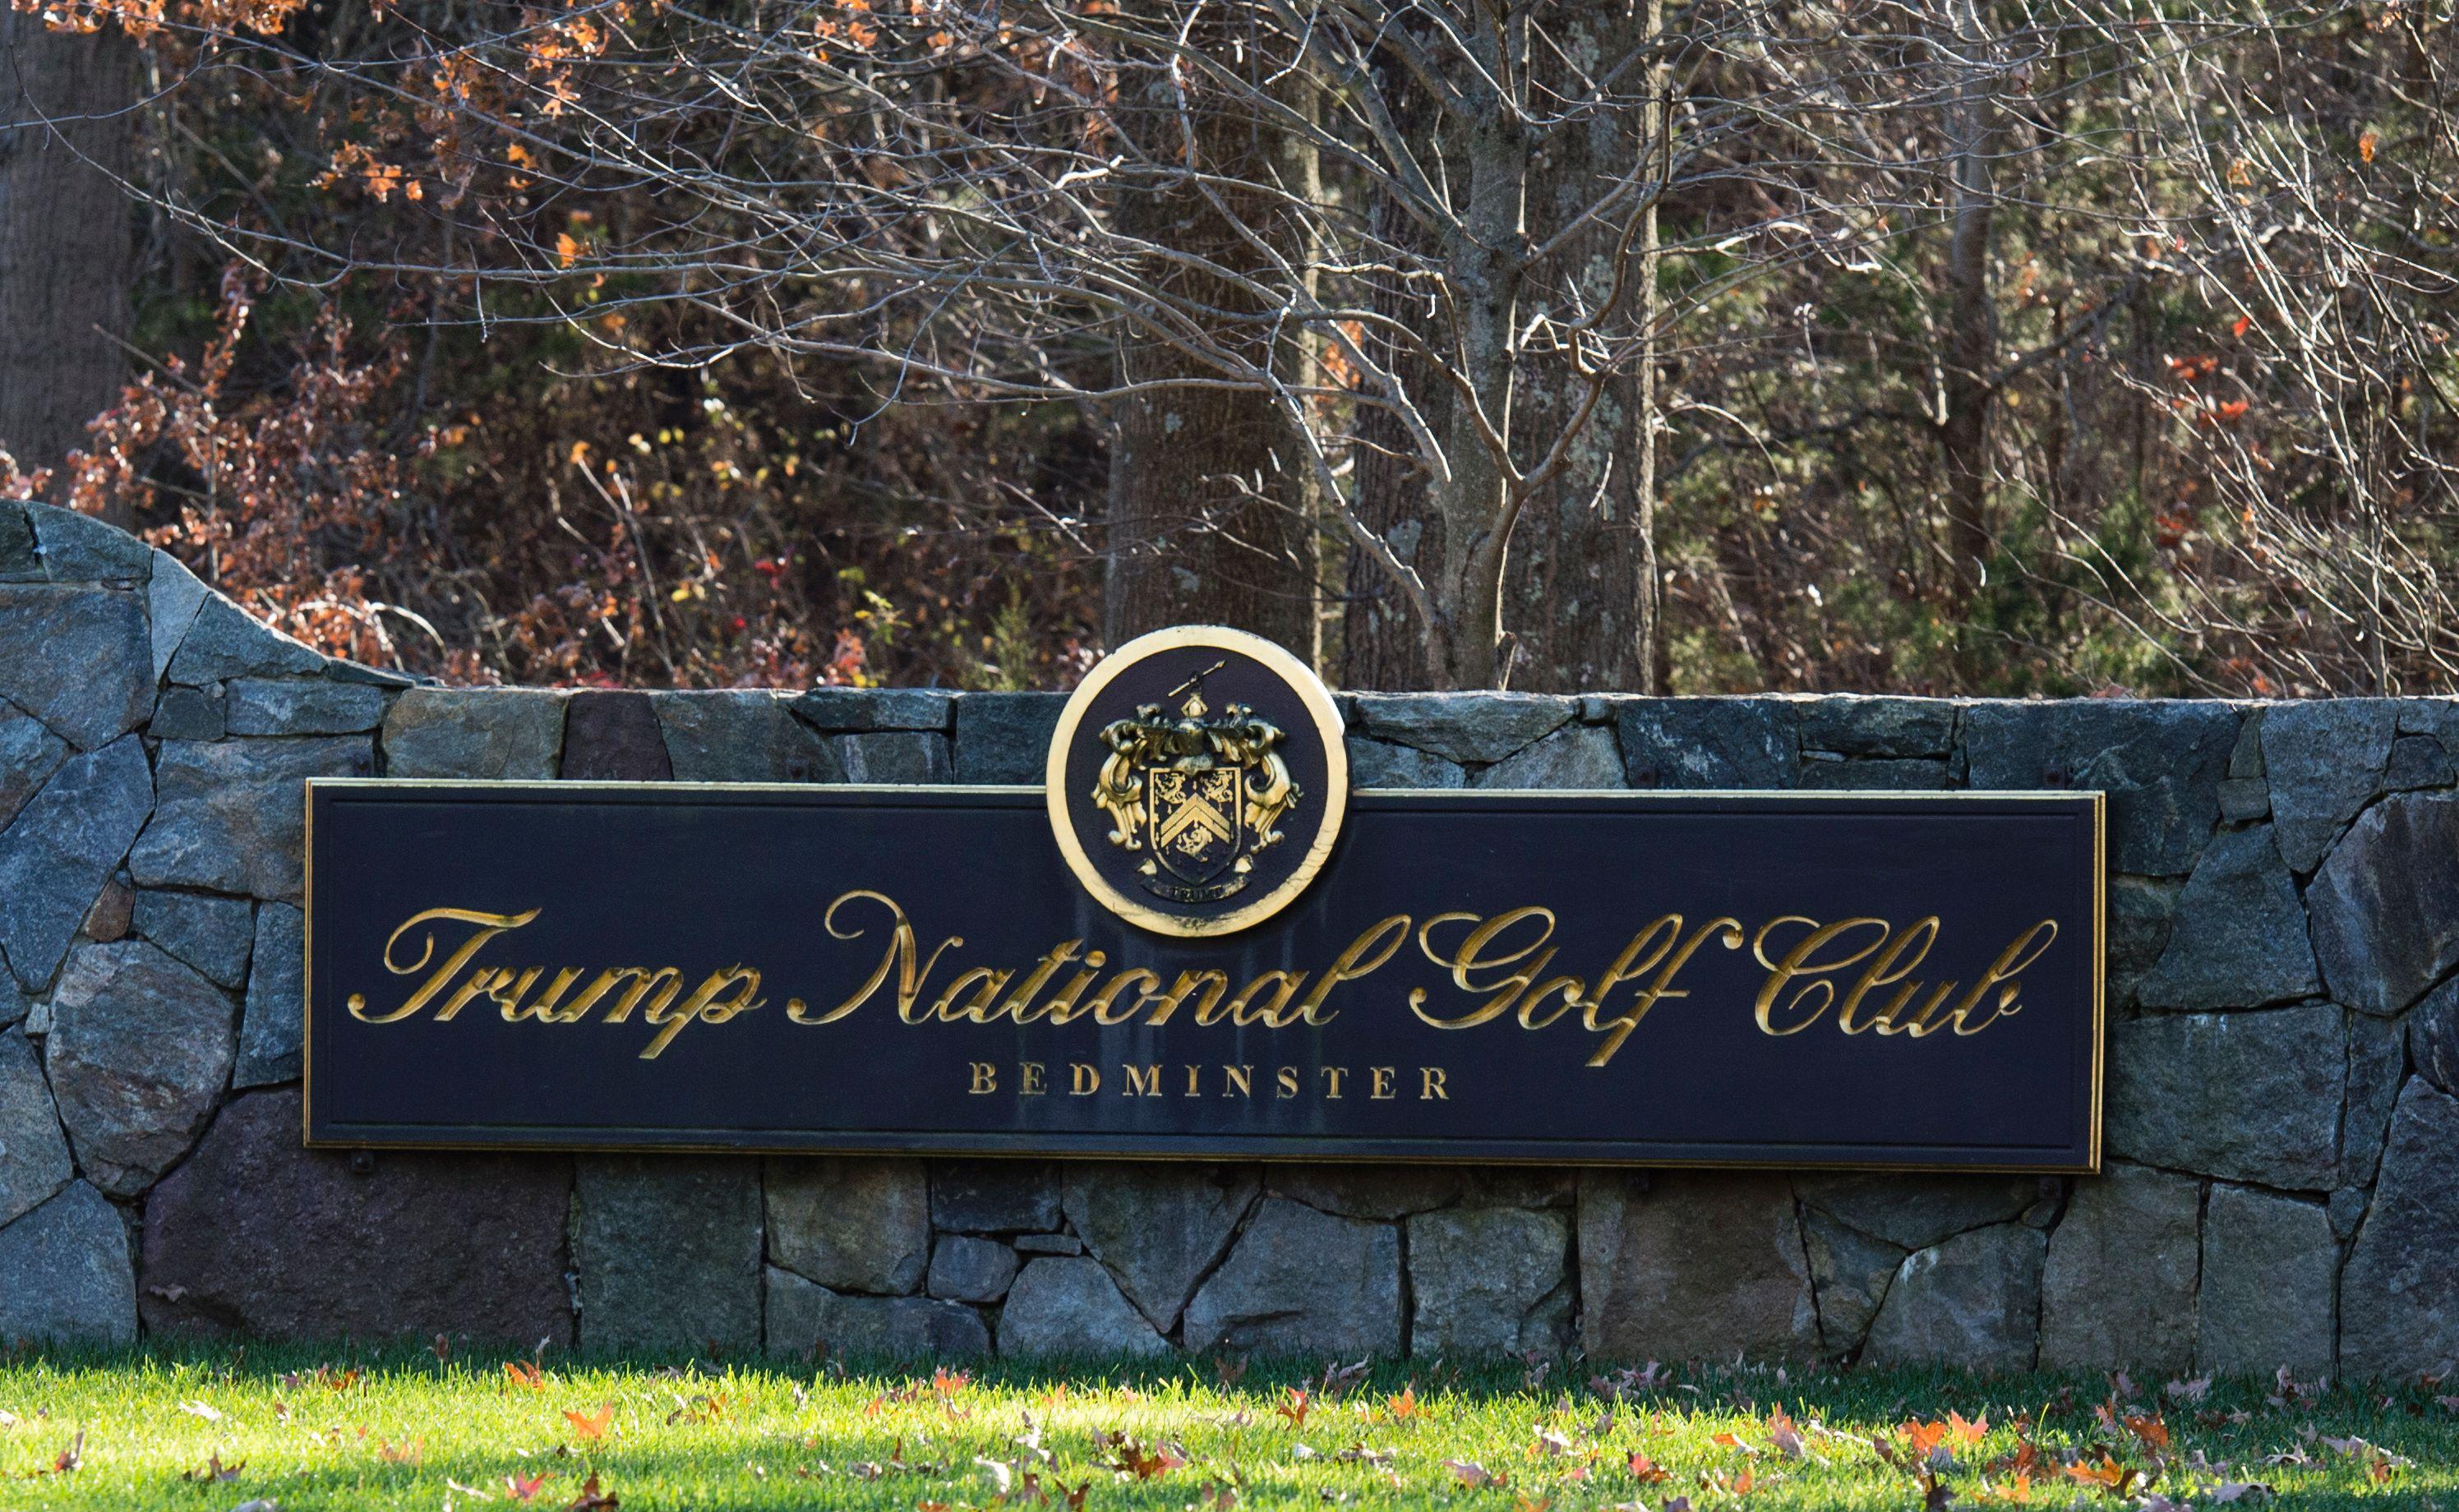 Trump Bedminster is one of 17 golf properties in the Trump Golf portfolio.